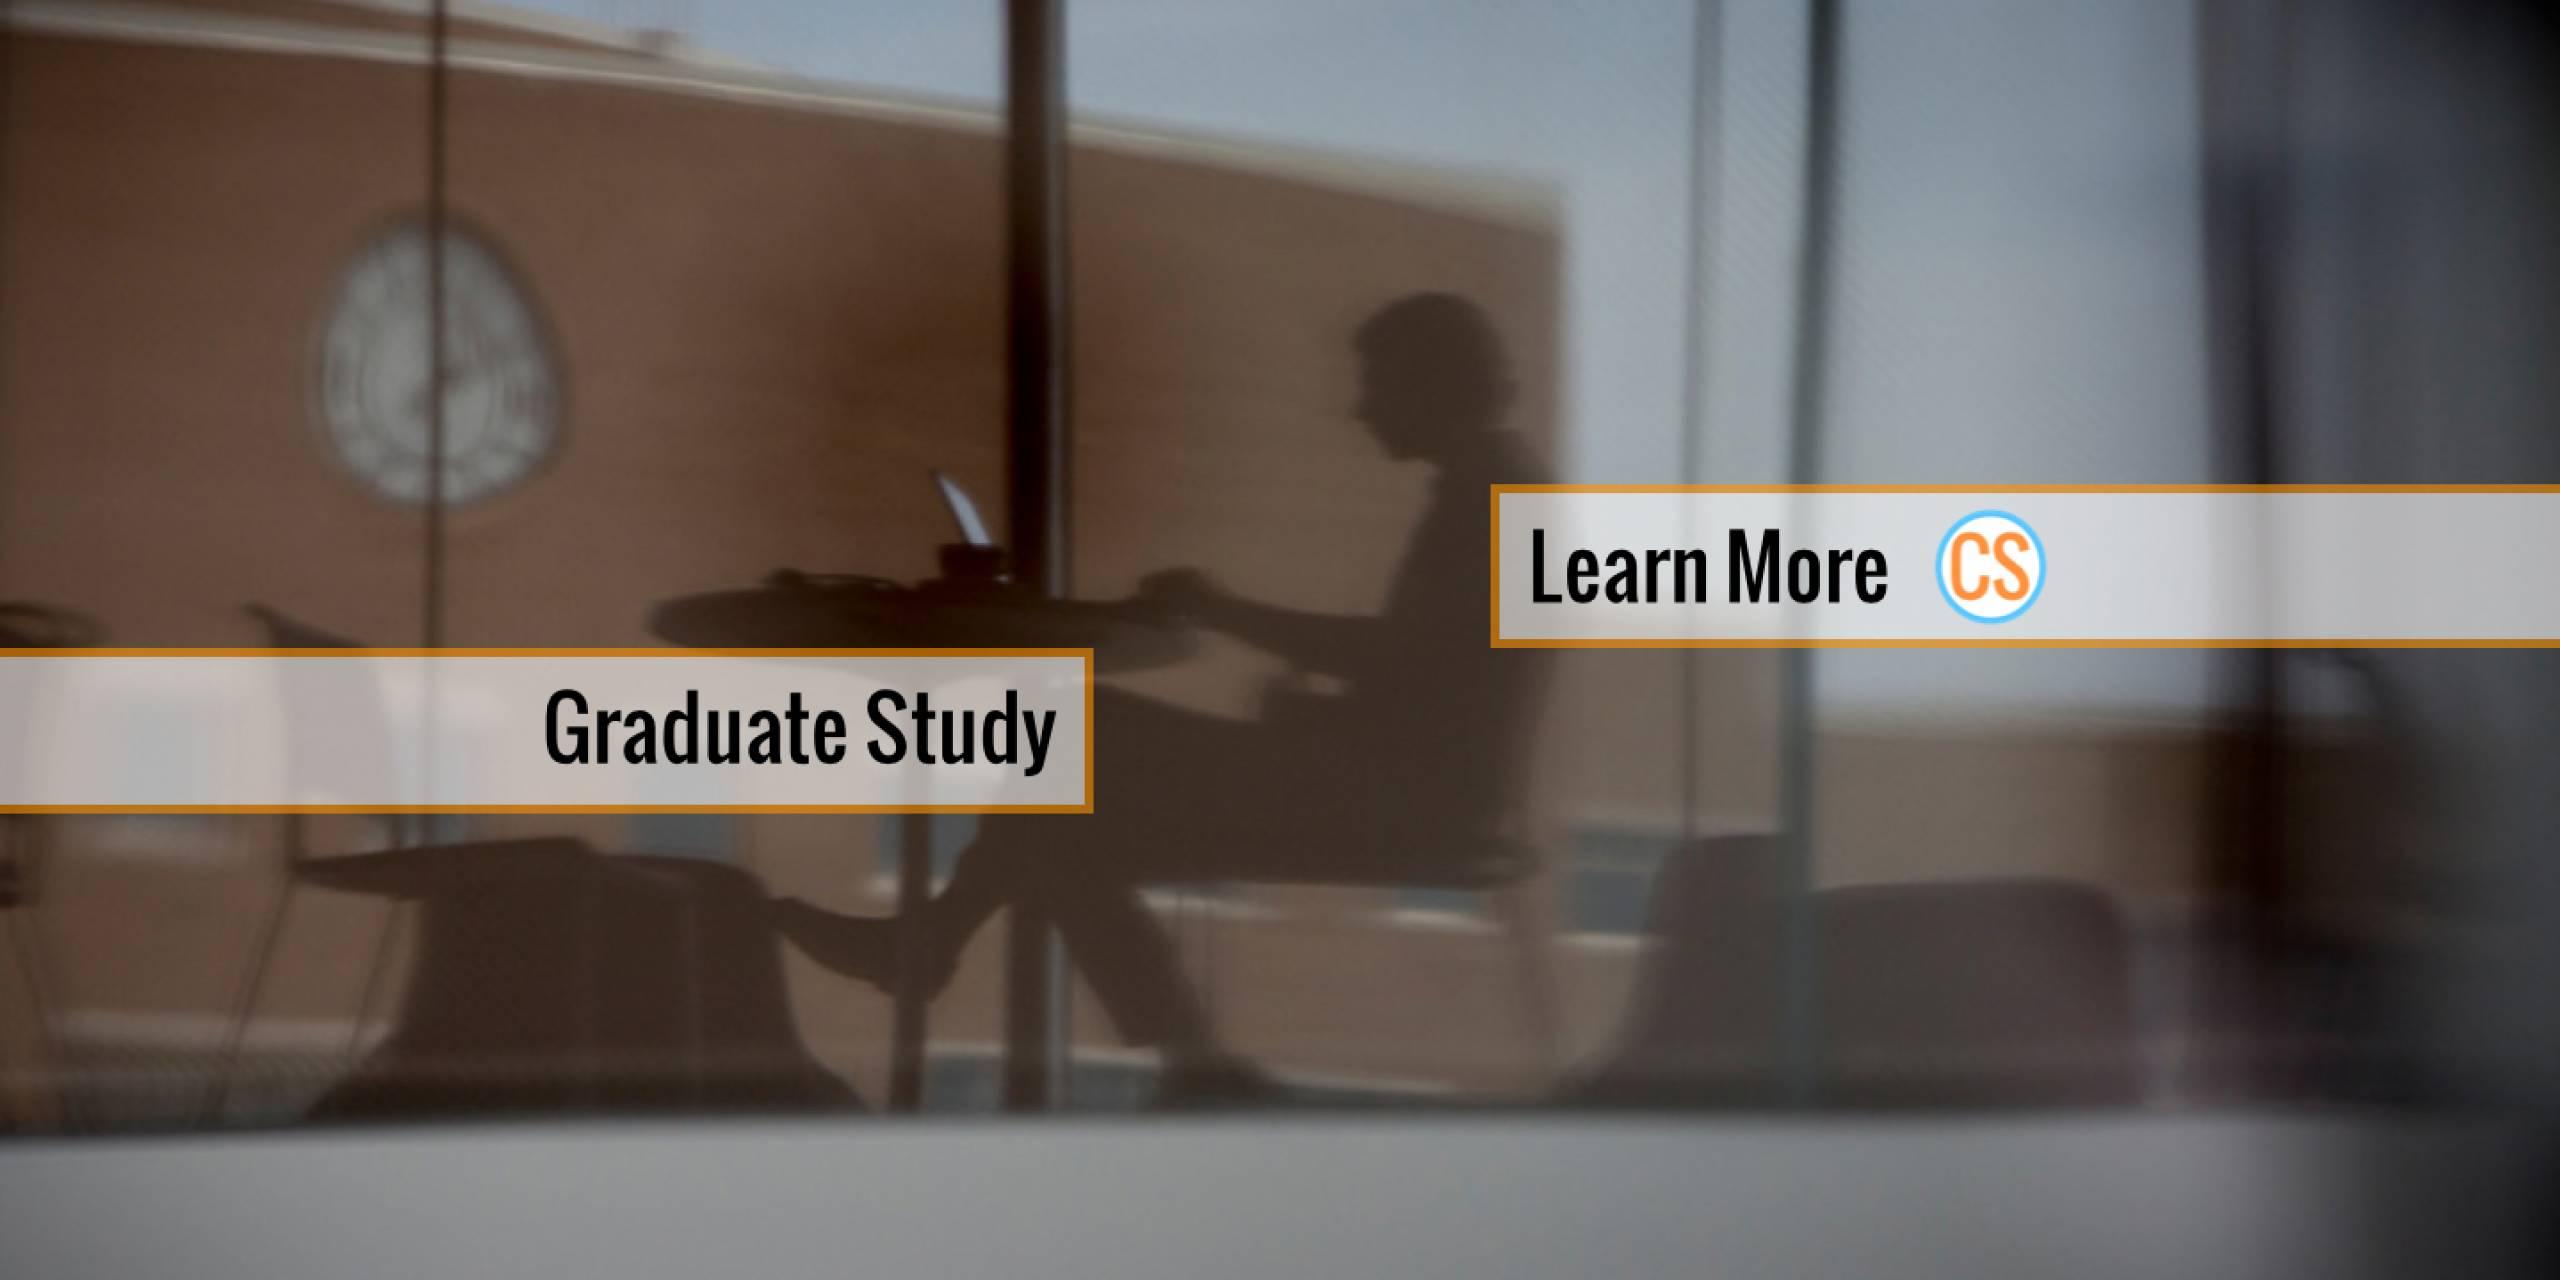 Graduate Study in CS, Learn More